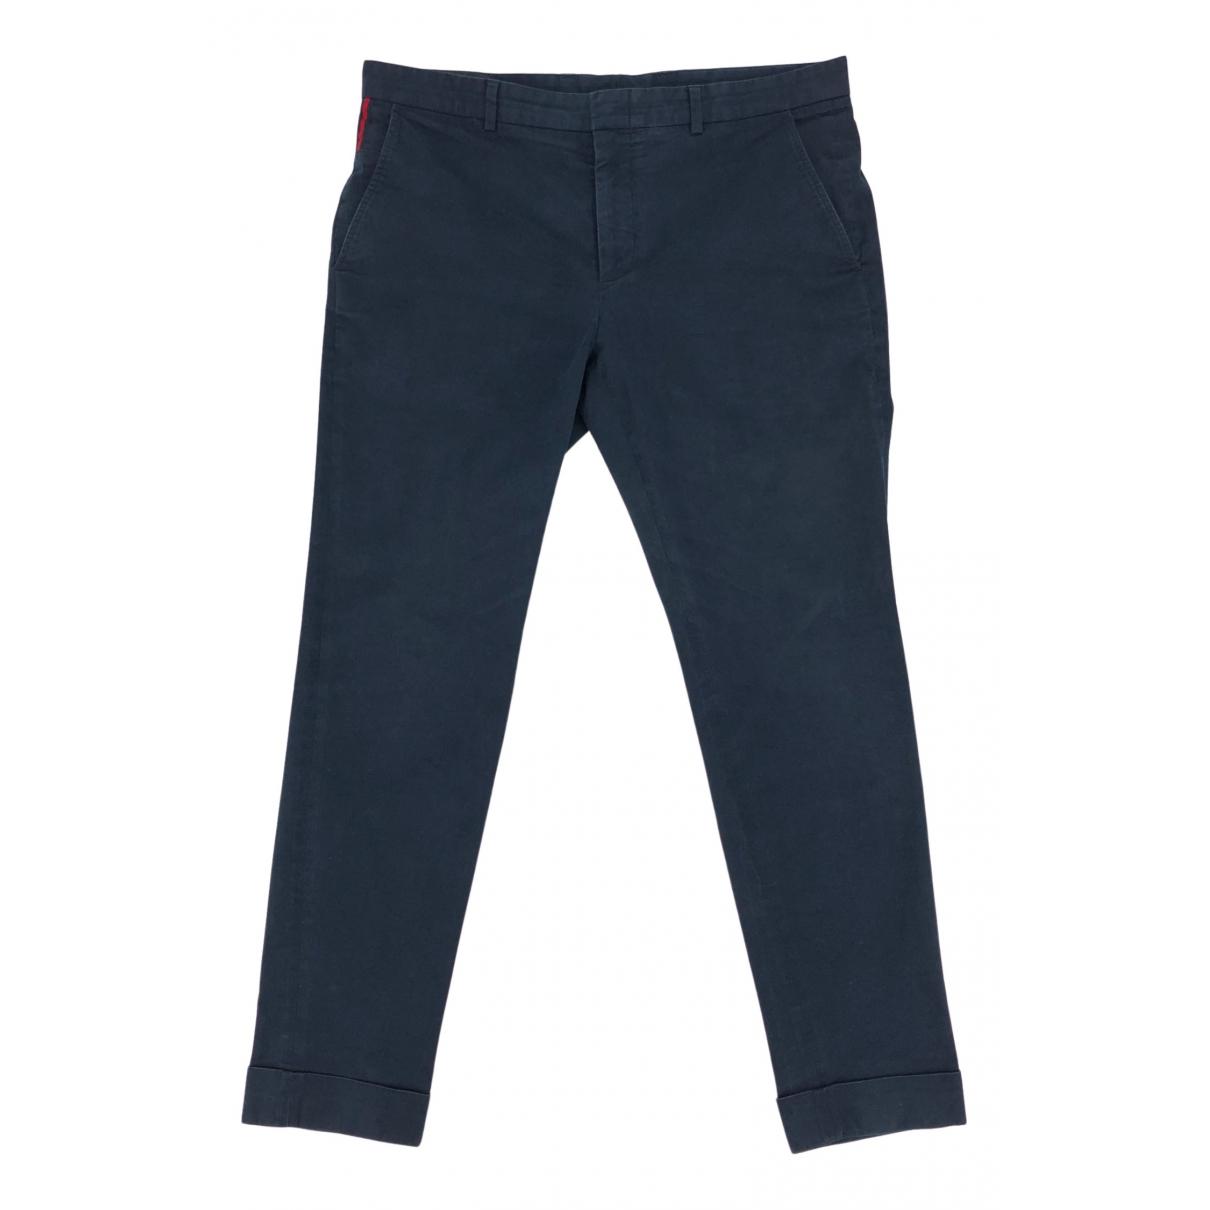 Gucci N Blue Cotton Trousers for Men 34 UK - US